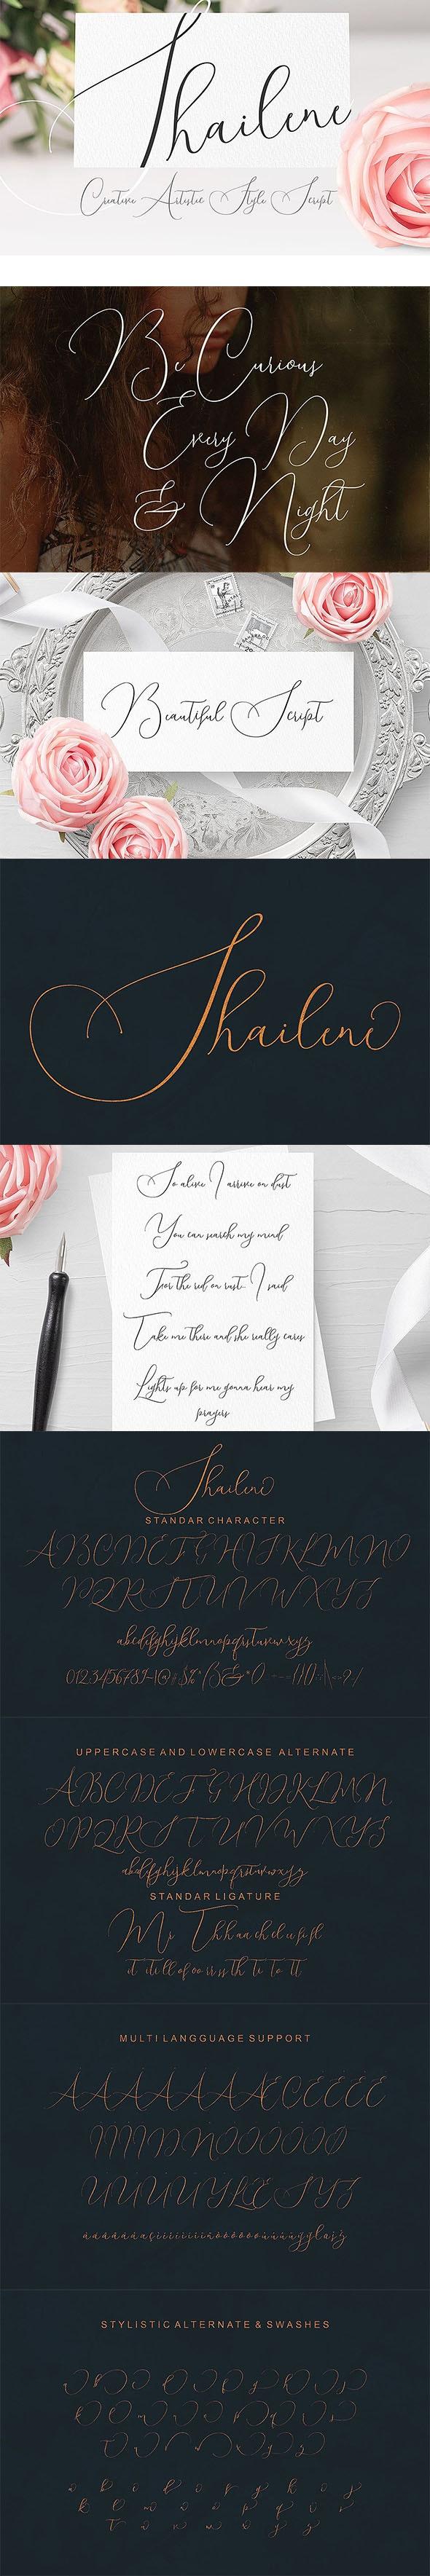 Shailene Script Font - Calligraphy Script